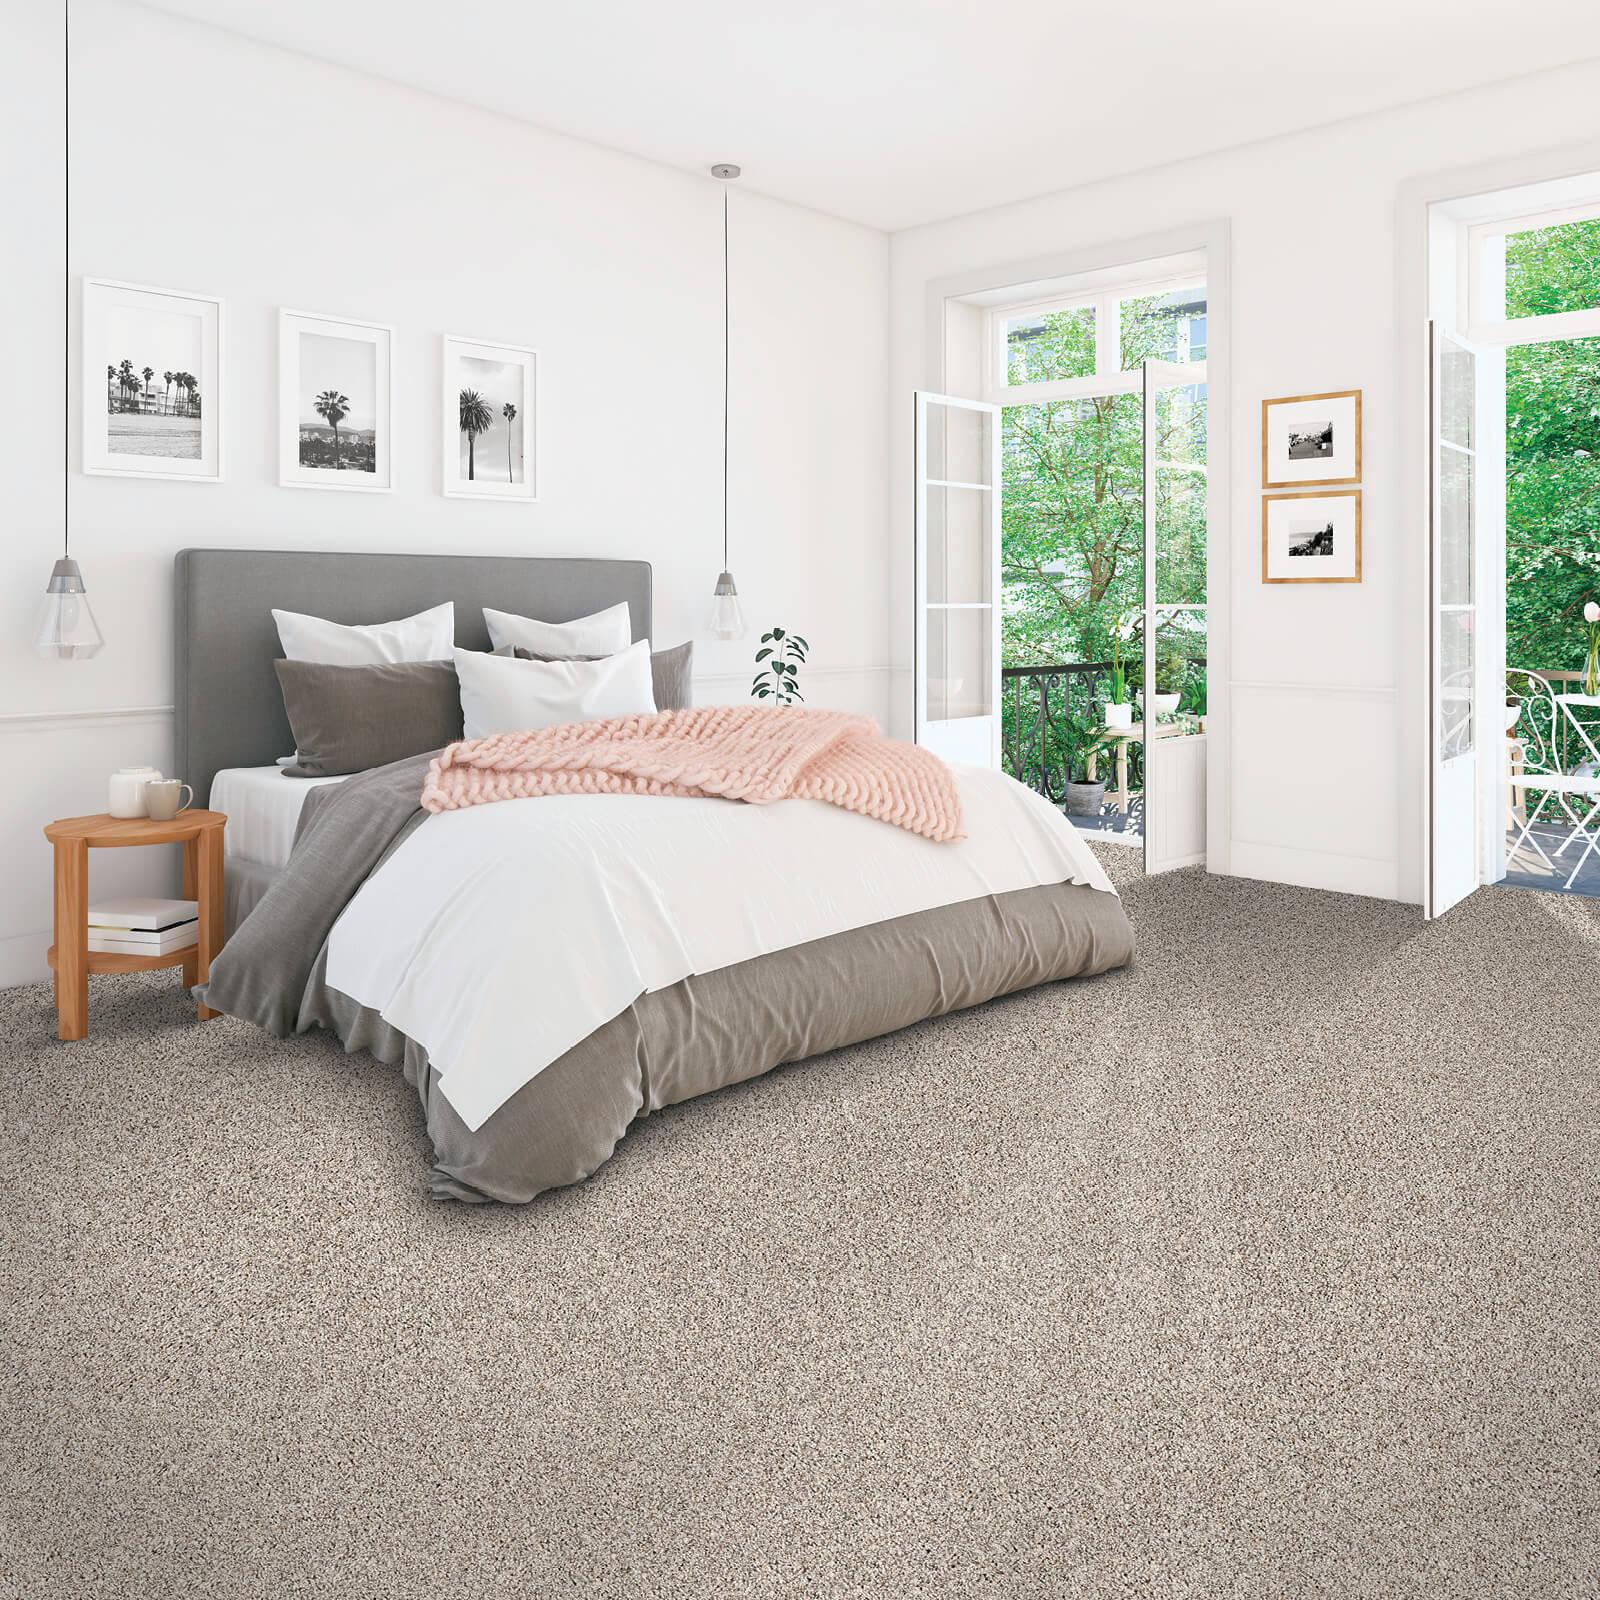 Grey carpet of bedroom | McSwain Carpet & Floors